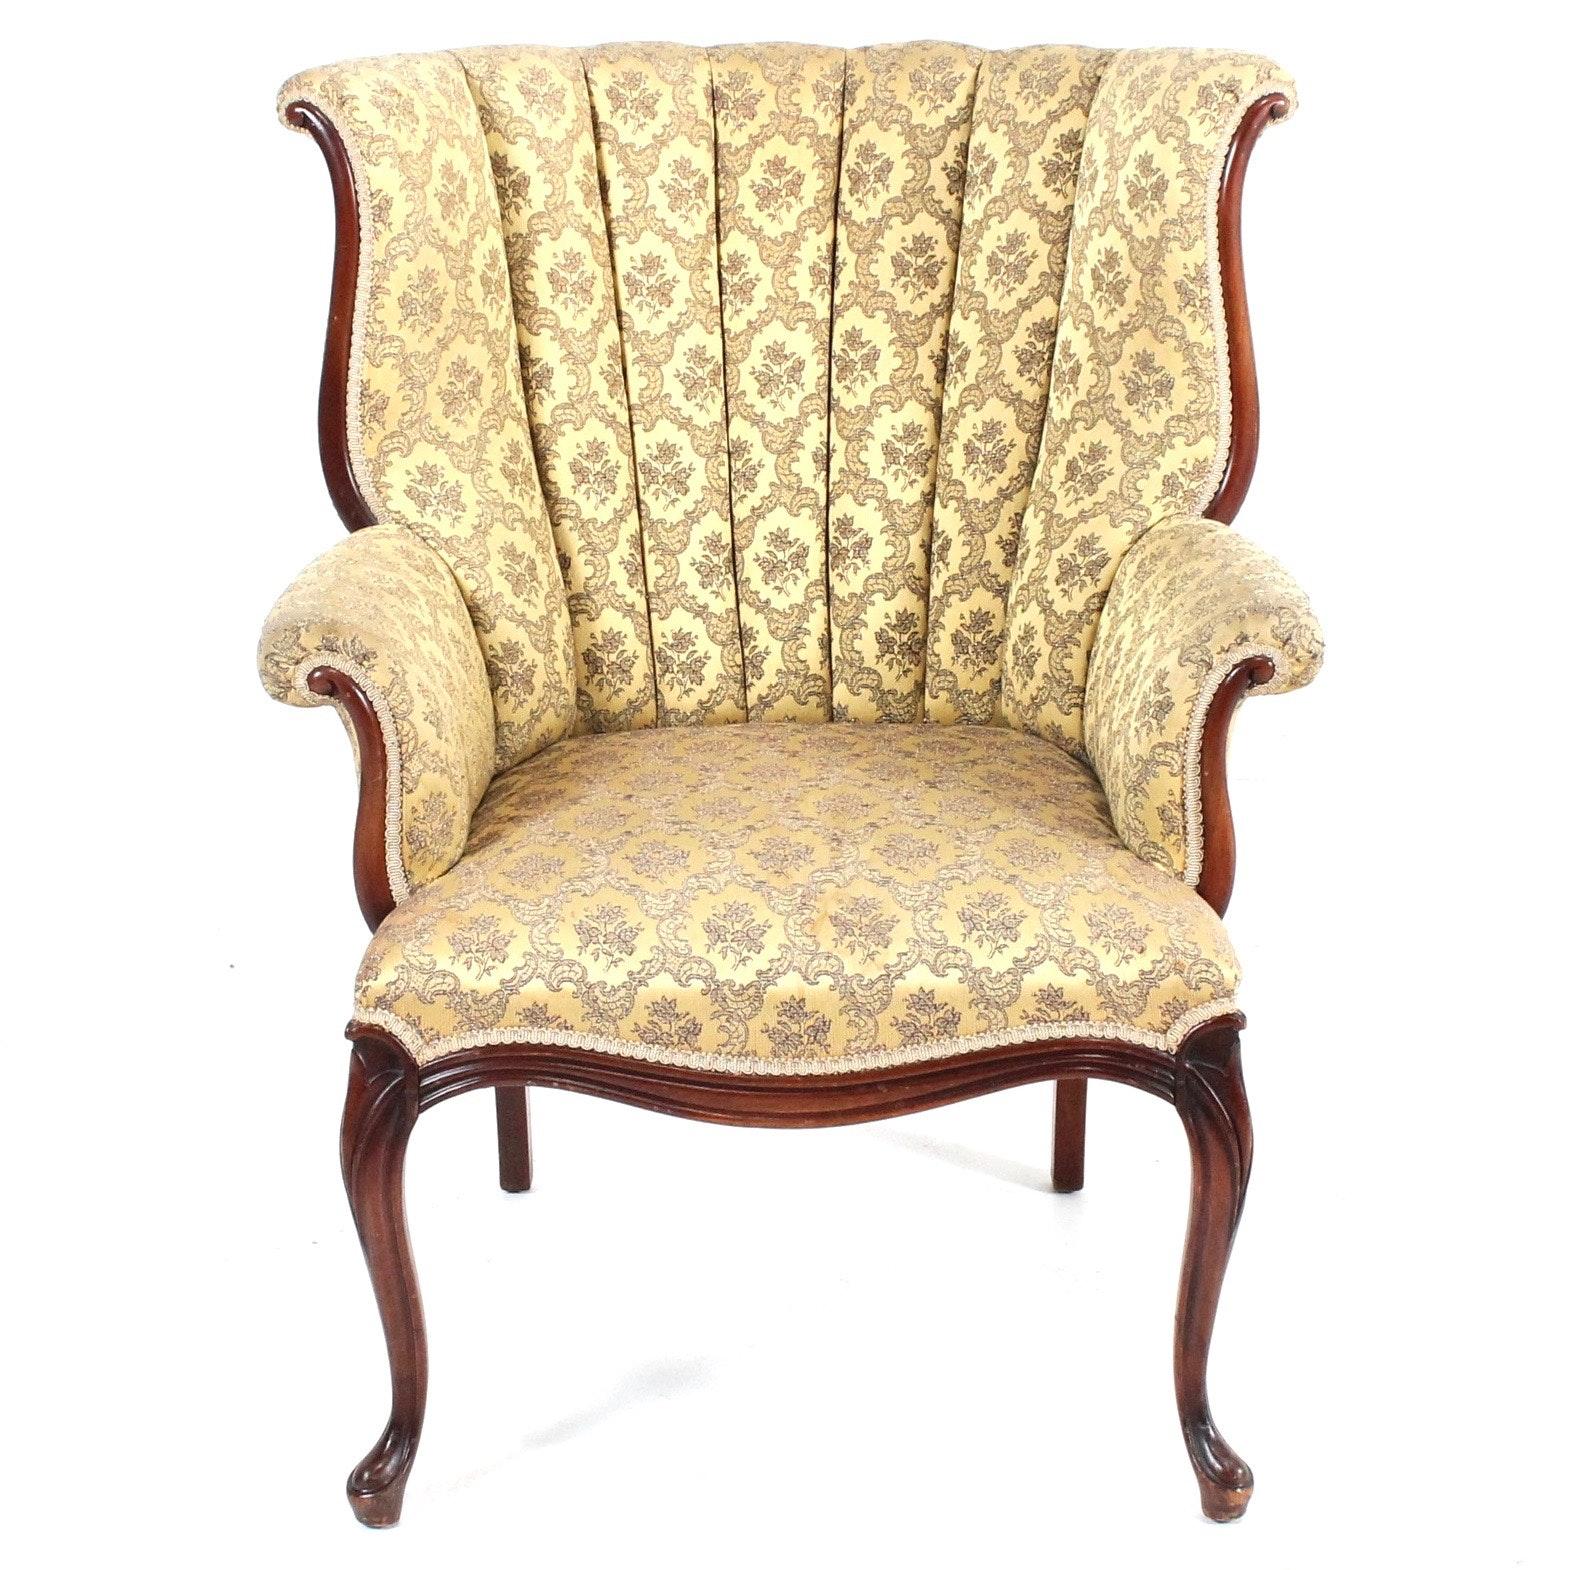 Vintage Fan Back Arm Chair